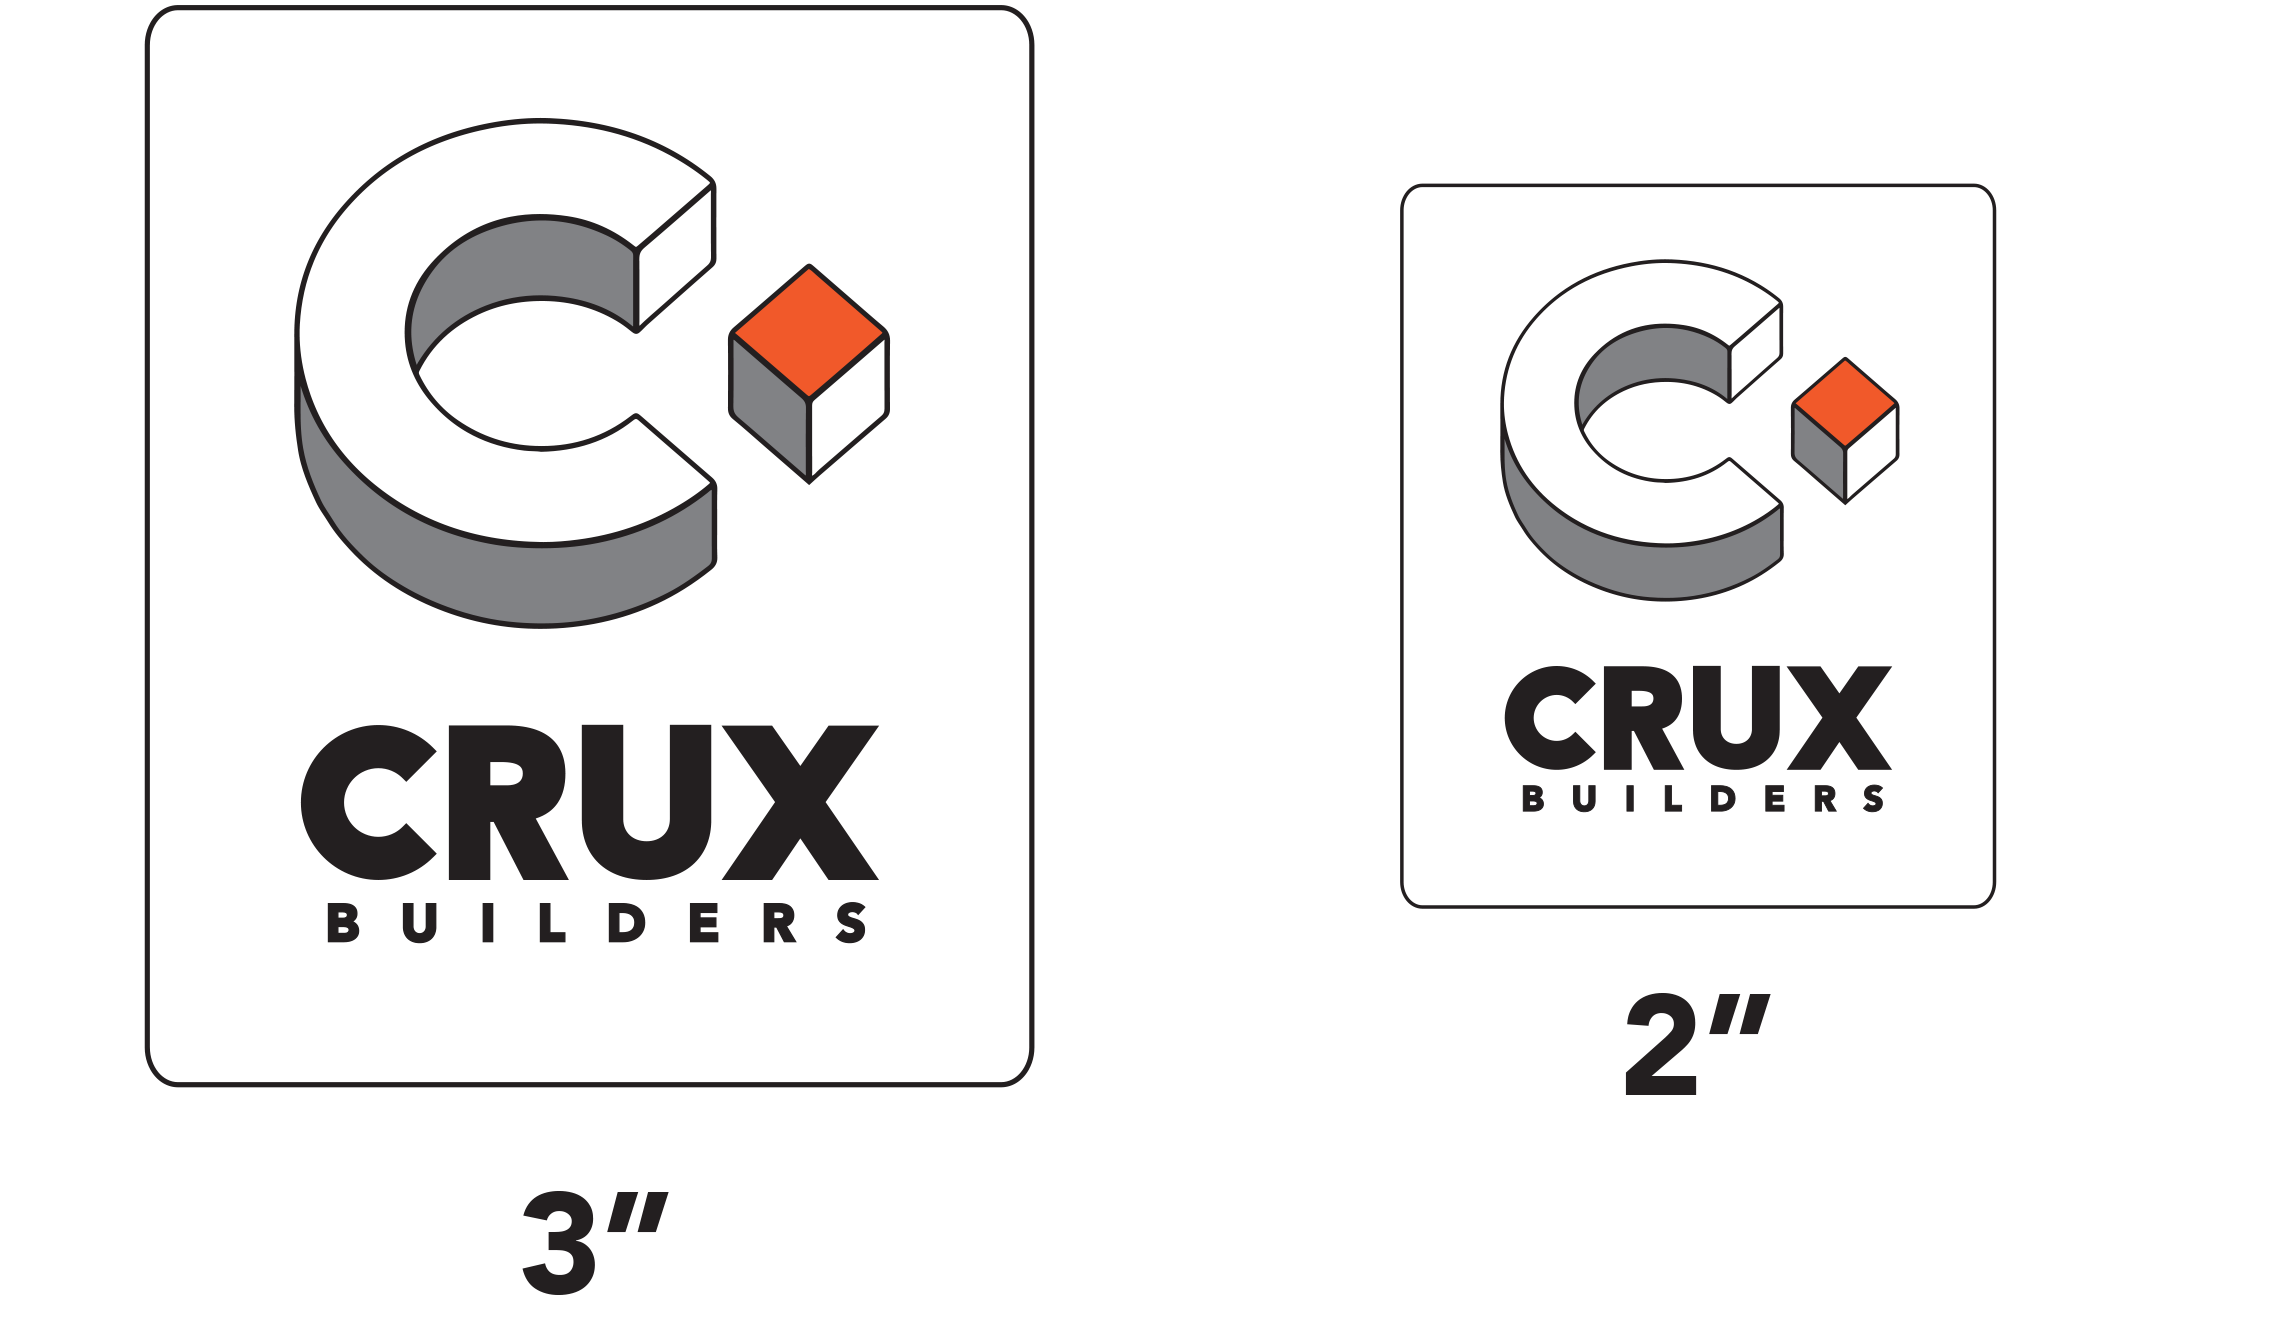 crux-samples 2.png